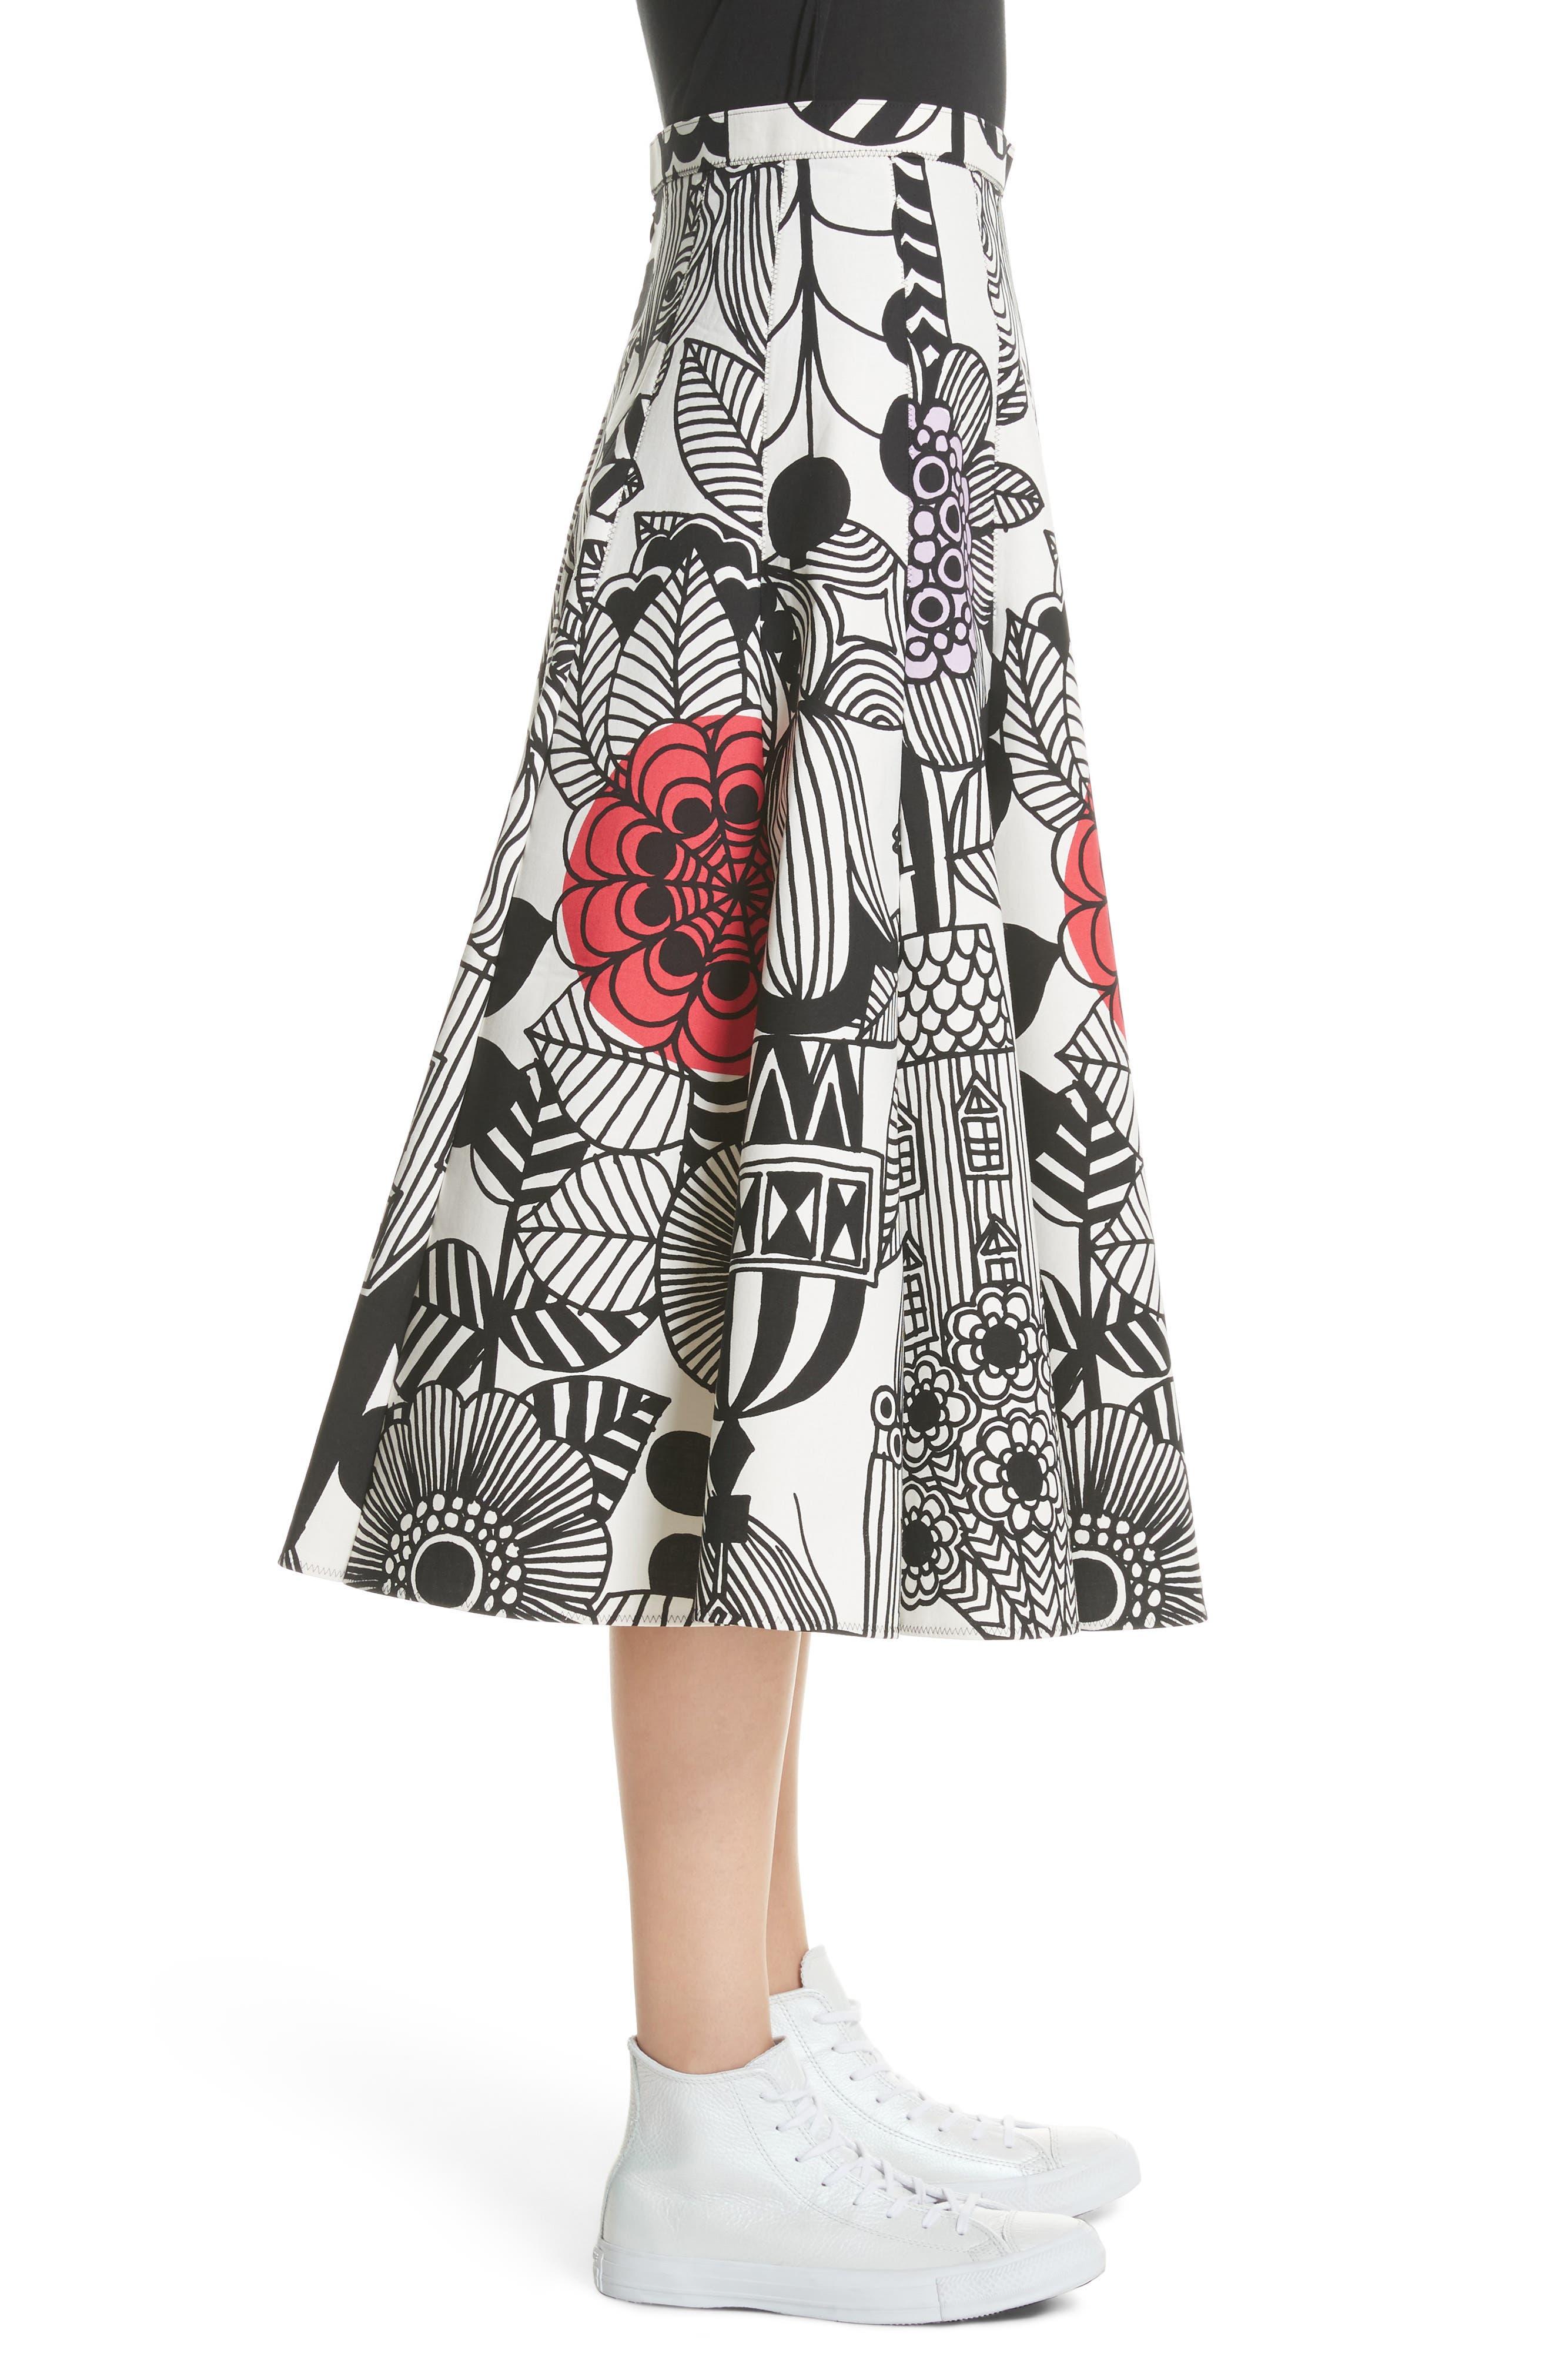 x Marimekko Vegetable Print Cotton Skirt,                             Alternate thumbnail 3, color,                             Wht/ Blk/ Ylw